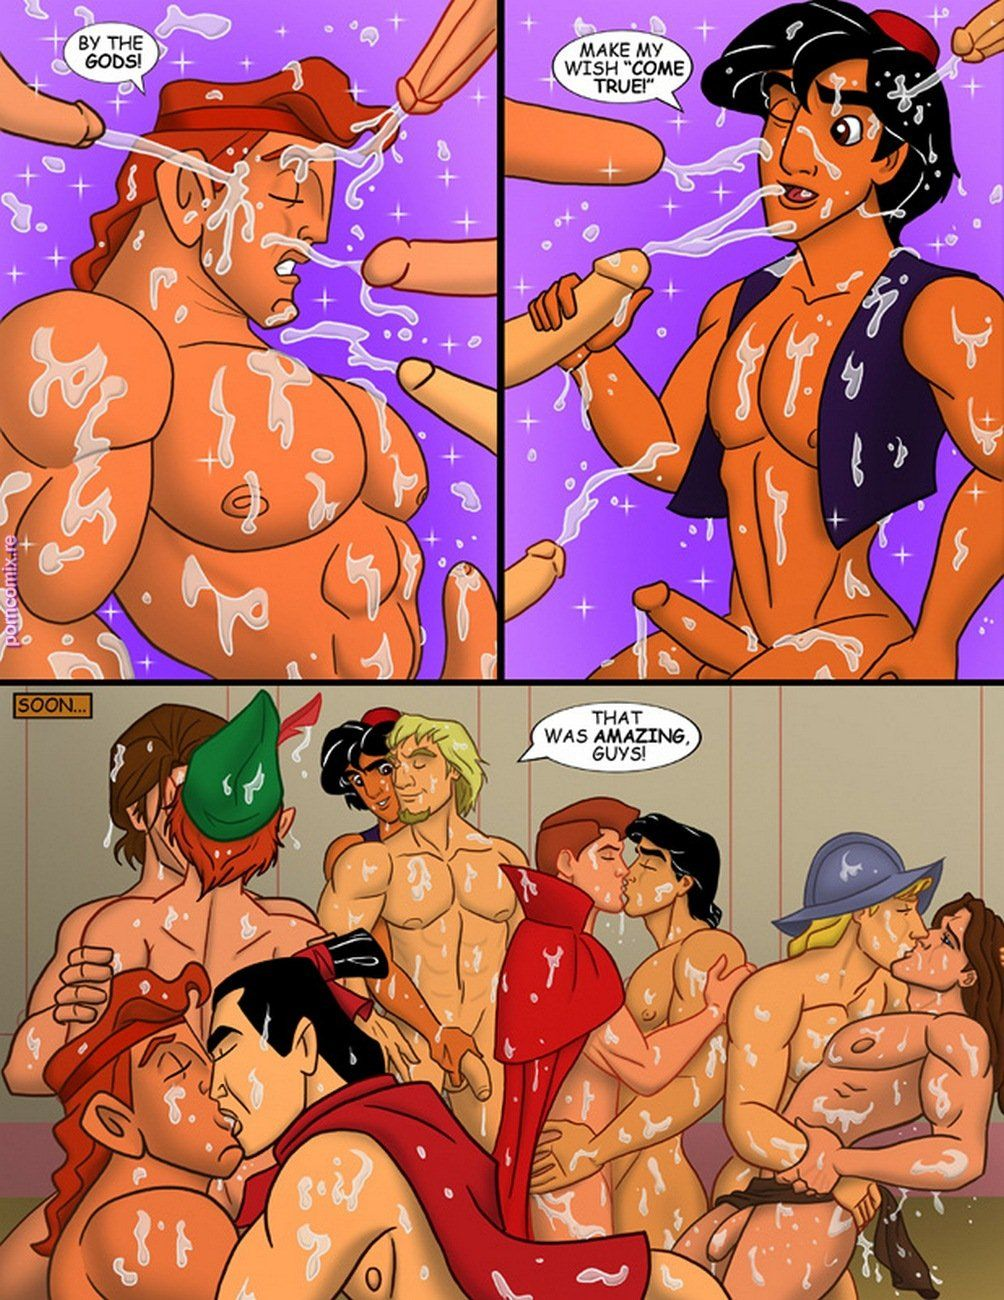 Бдсм порно комиксы - suski.in